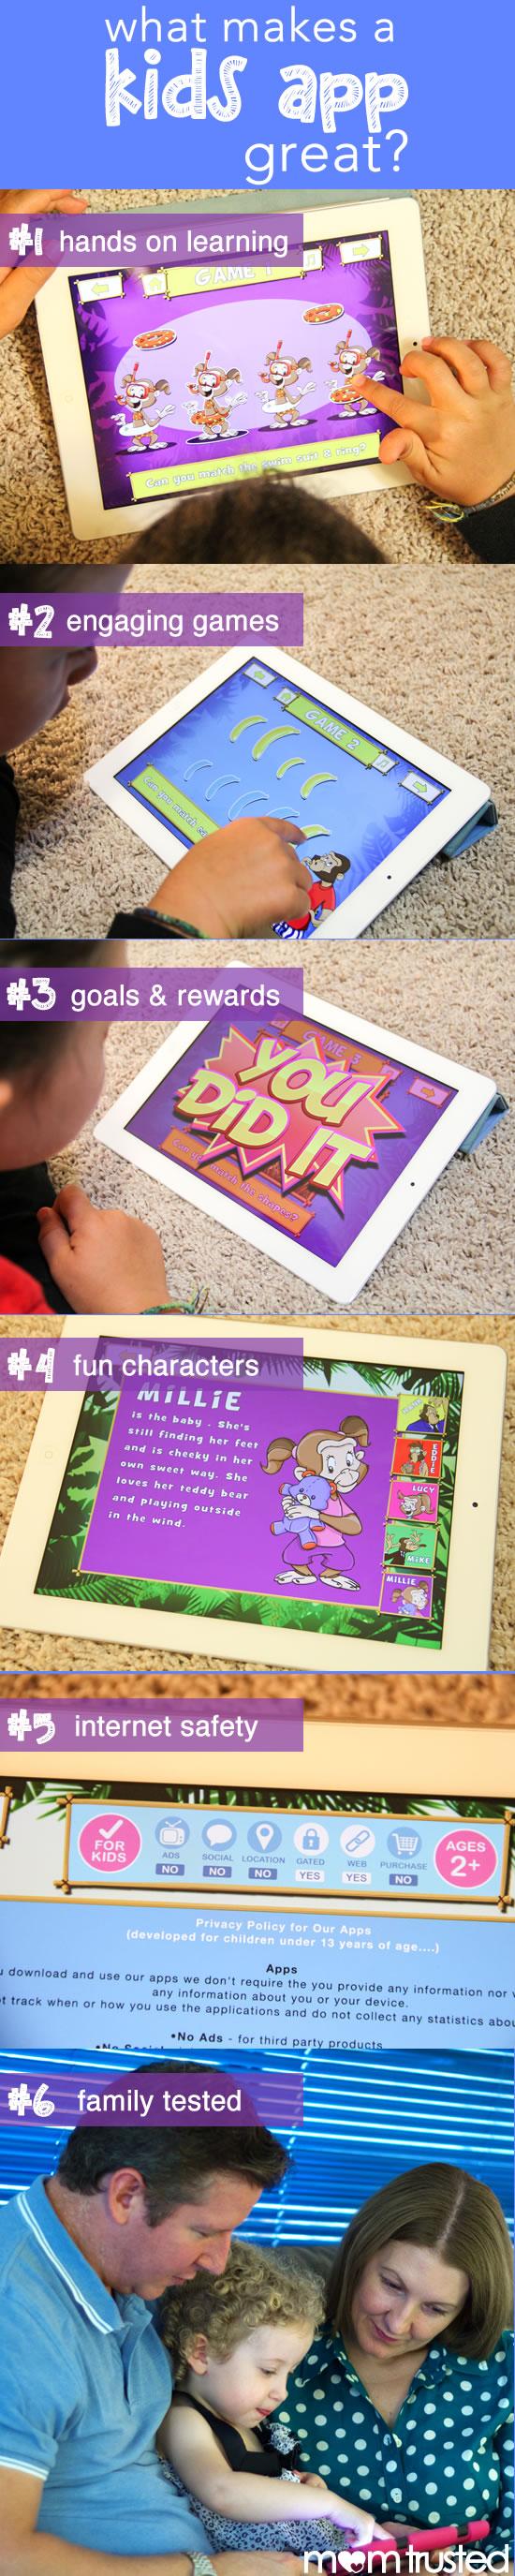 what makes a good kids app